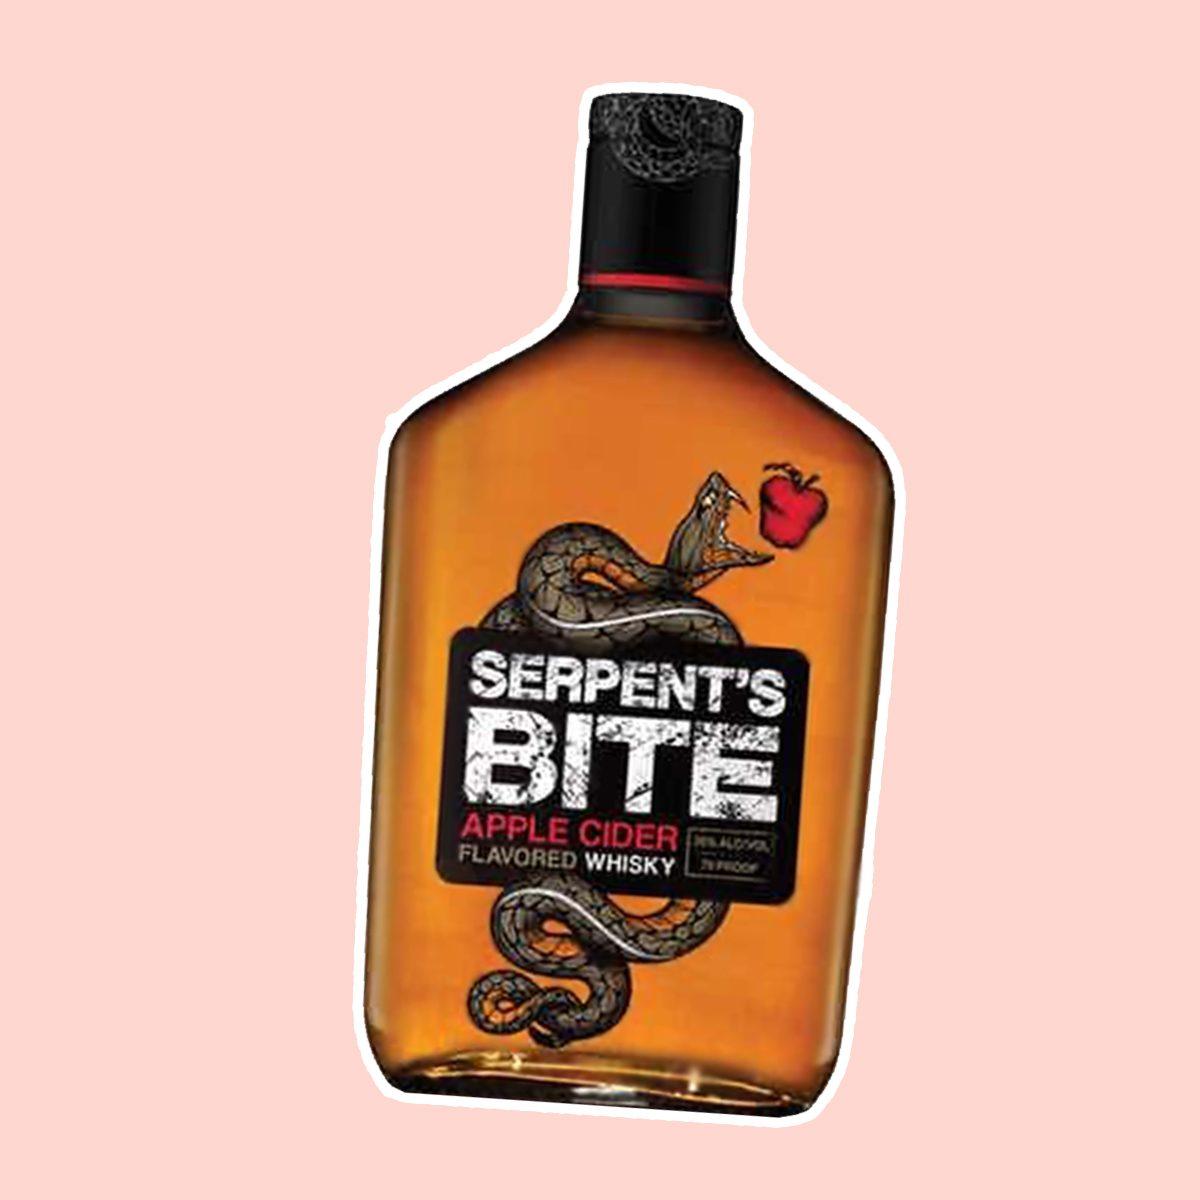 Serpent's Bite Apple Cider Whisky